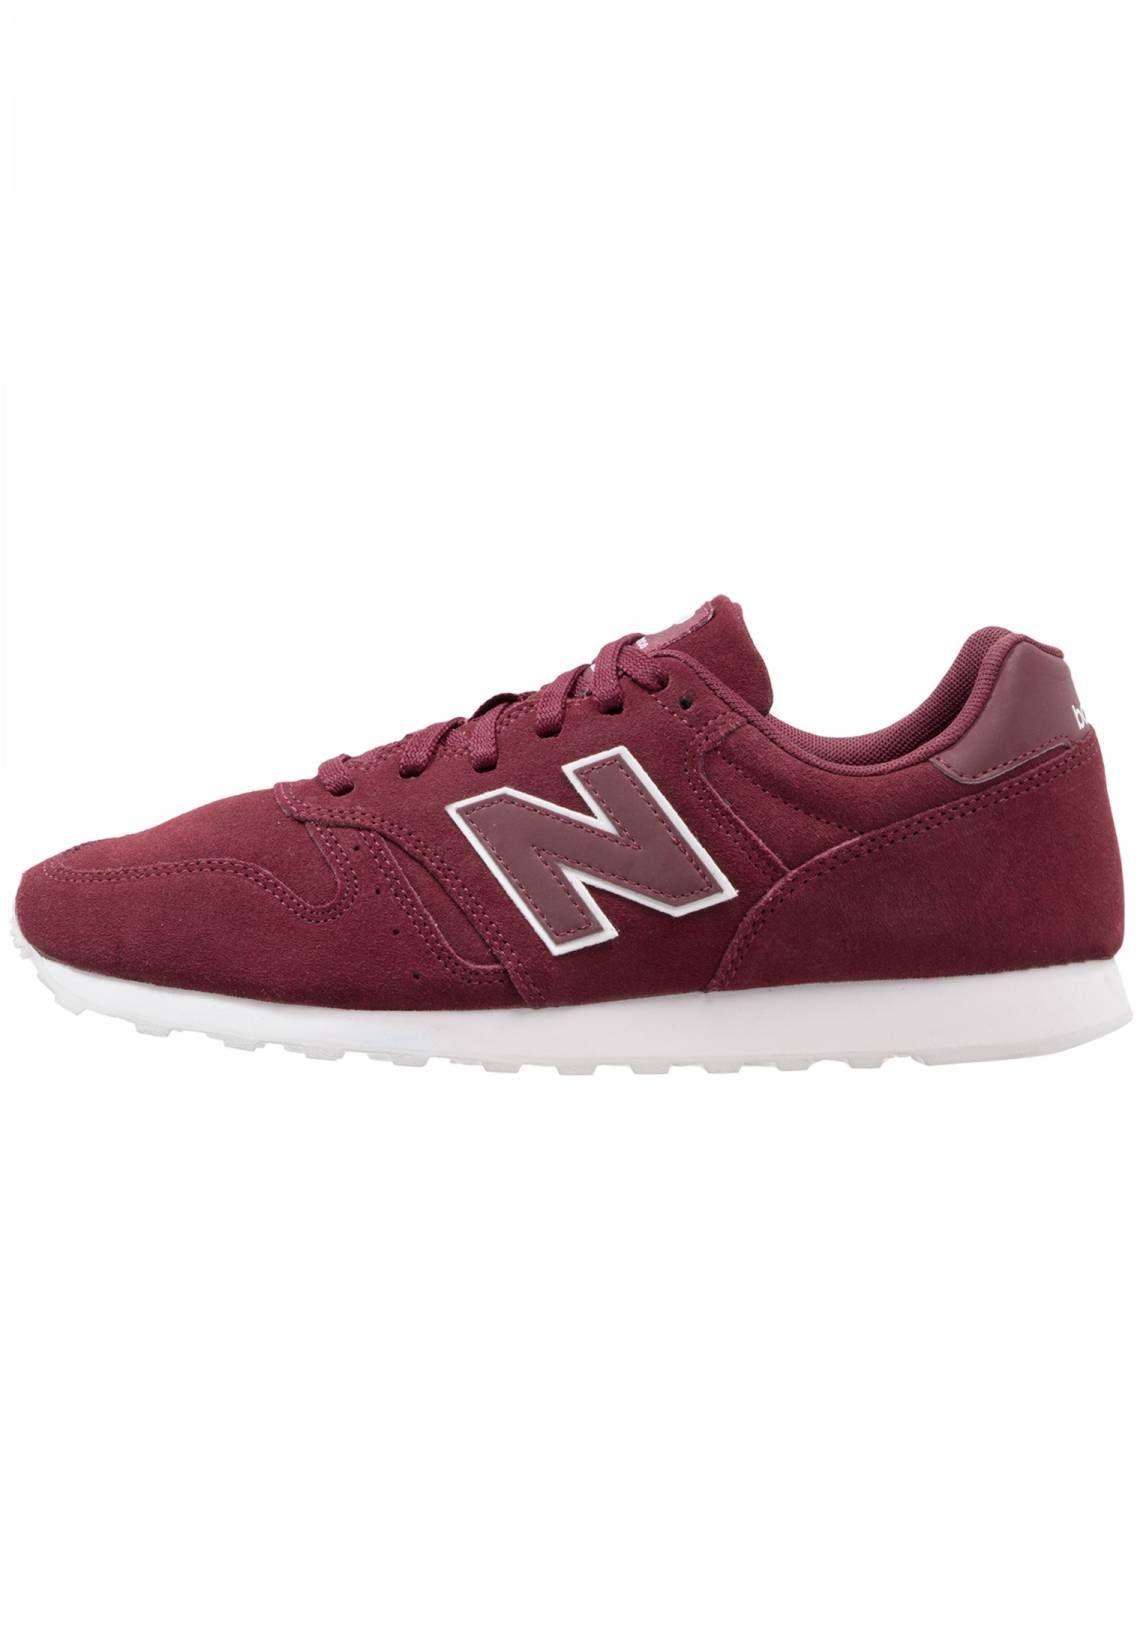 New Balance. ML373 - Zapatillas - burgundy. Suela:fibra ...